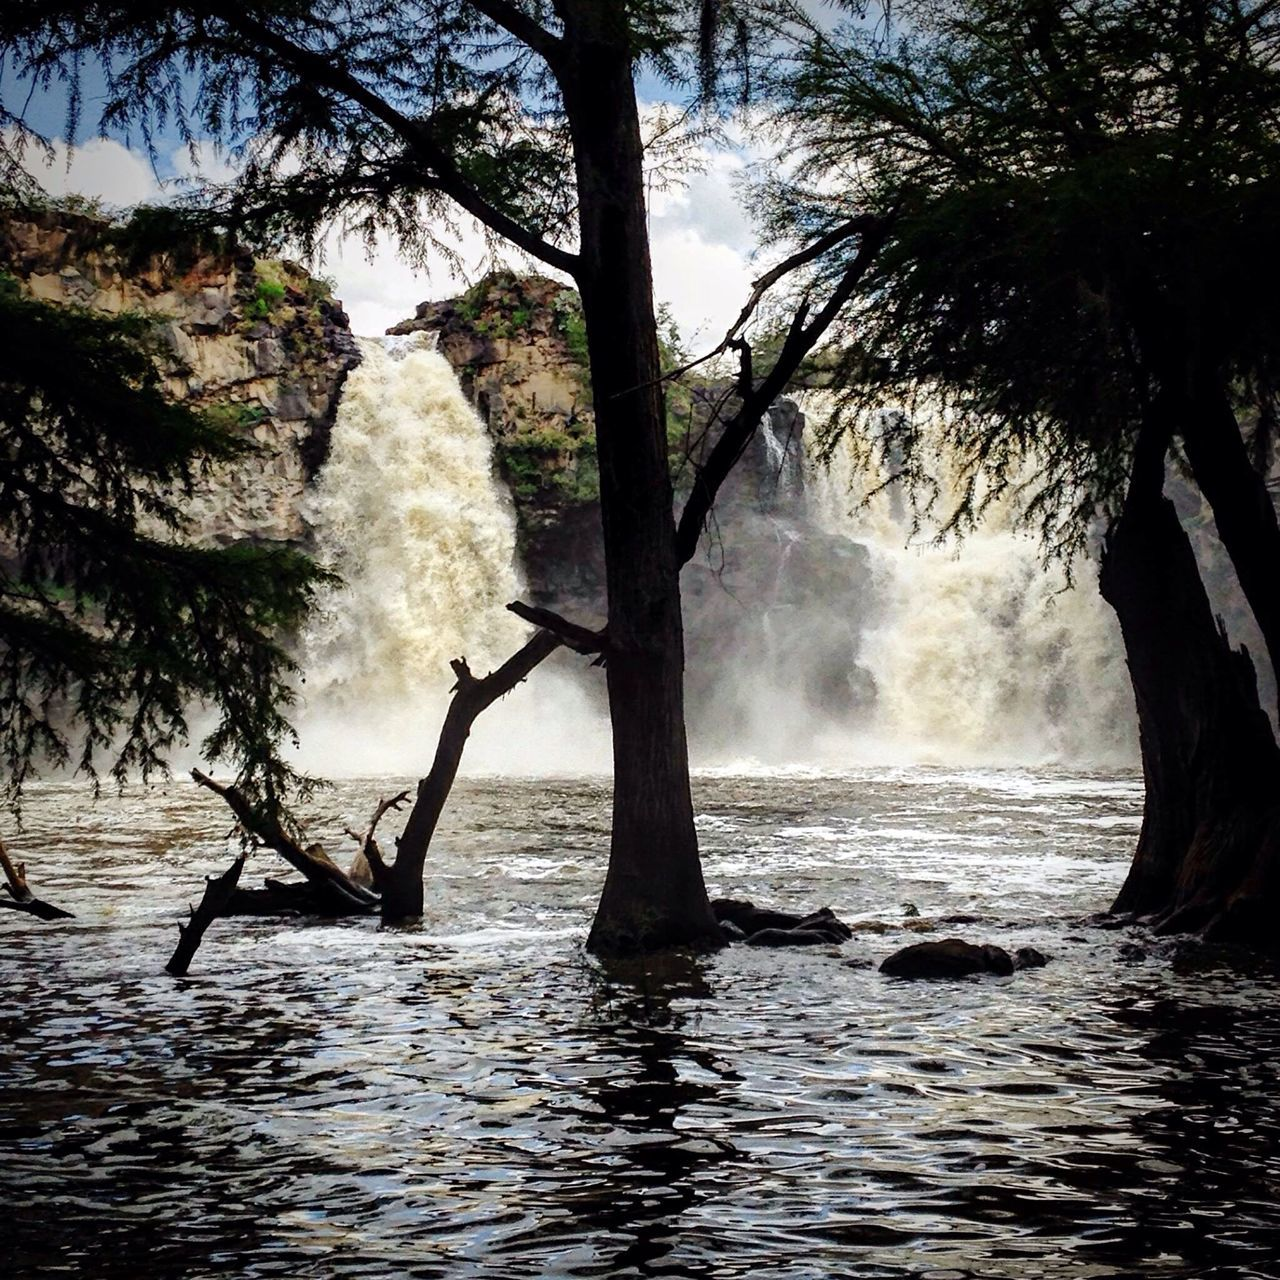 Cascadas de El Saltito en el municipio de Nombre De Dios DurangoMX Nature Water Beauty In Nature Landscape Beatiful Nature Paisaje Relaxing Cascada Fall Naturaleza🌾🌿 Naturaleza